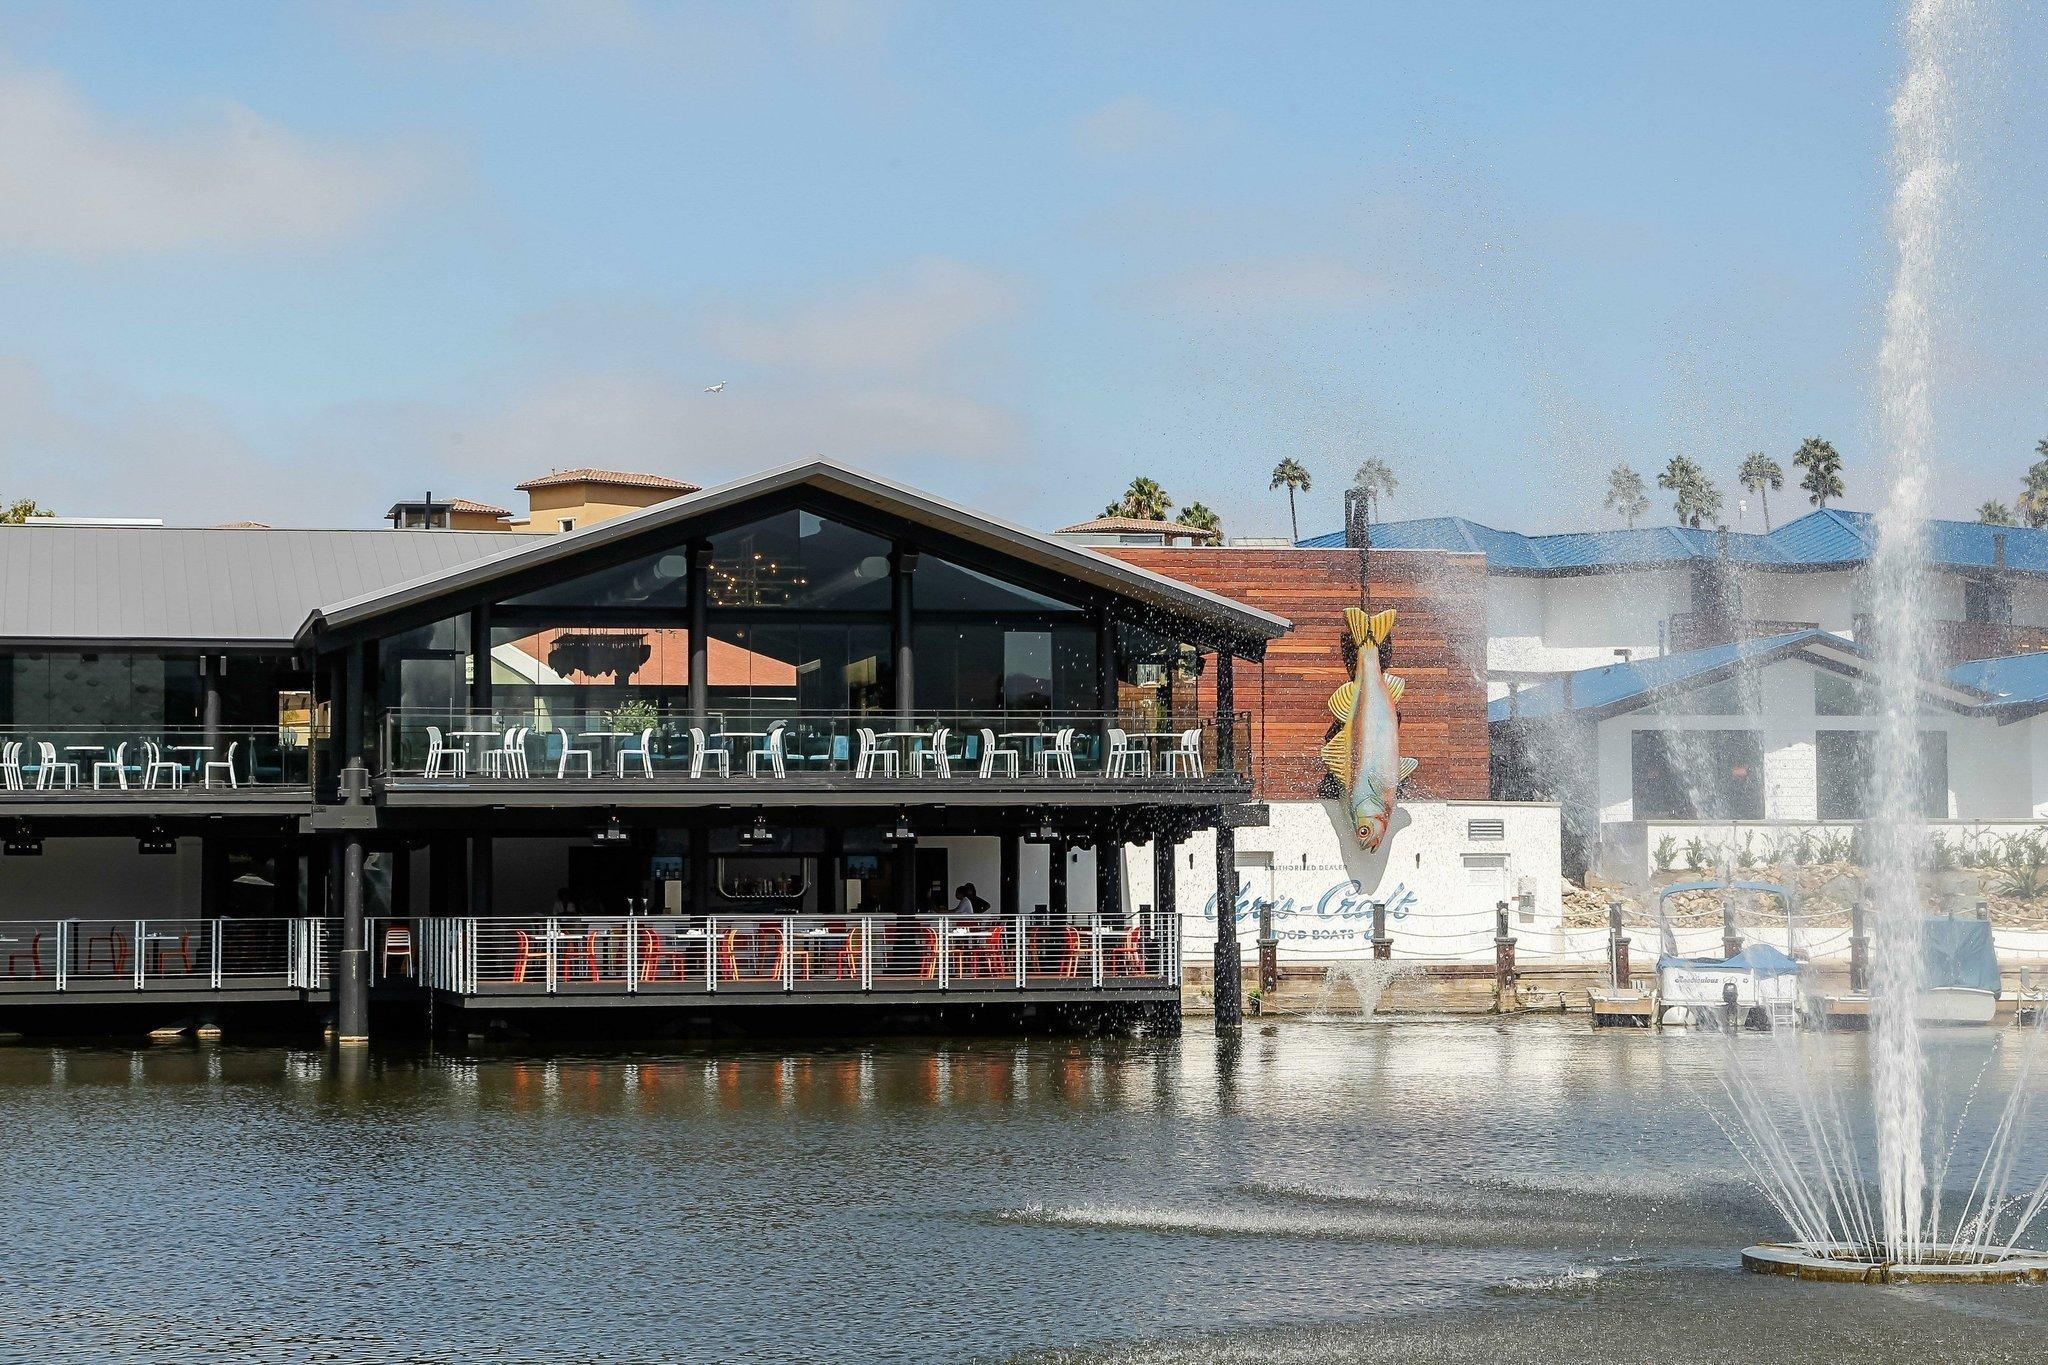 New restaurant furthers lake san marcos revamp the san diego union tribune - Quails inn restaurant san marcos ...